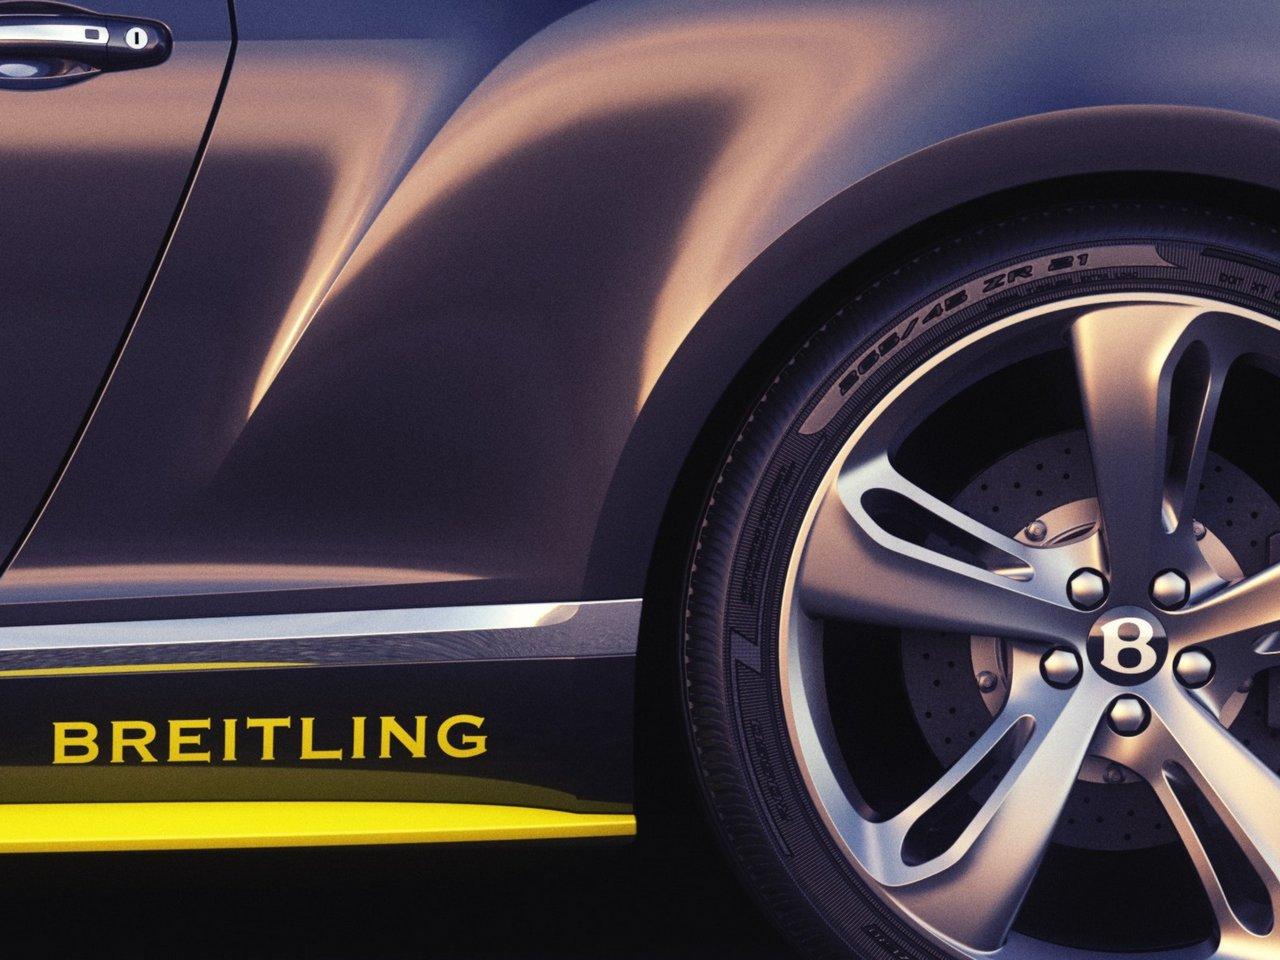 bentley-continental-gt-speed-breitling-jet-team-series_0-100_4